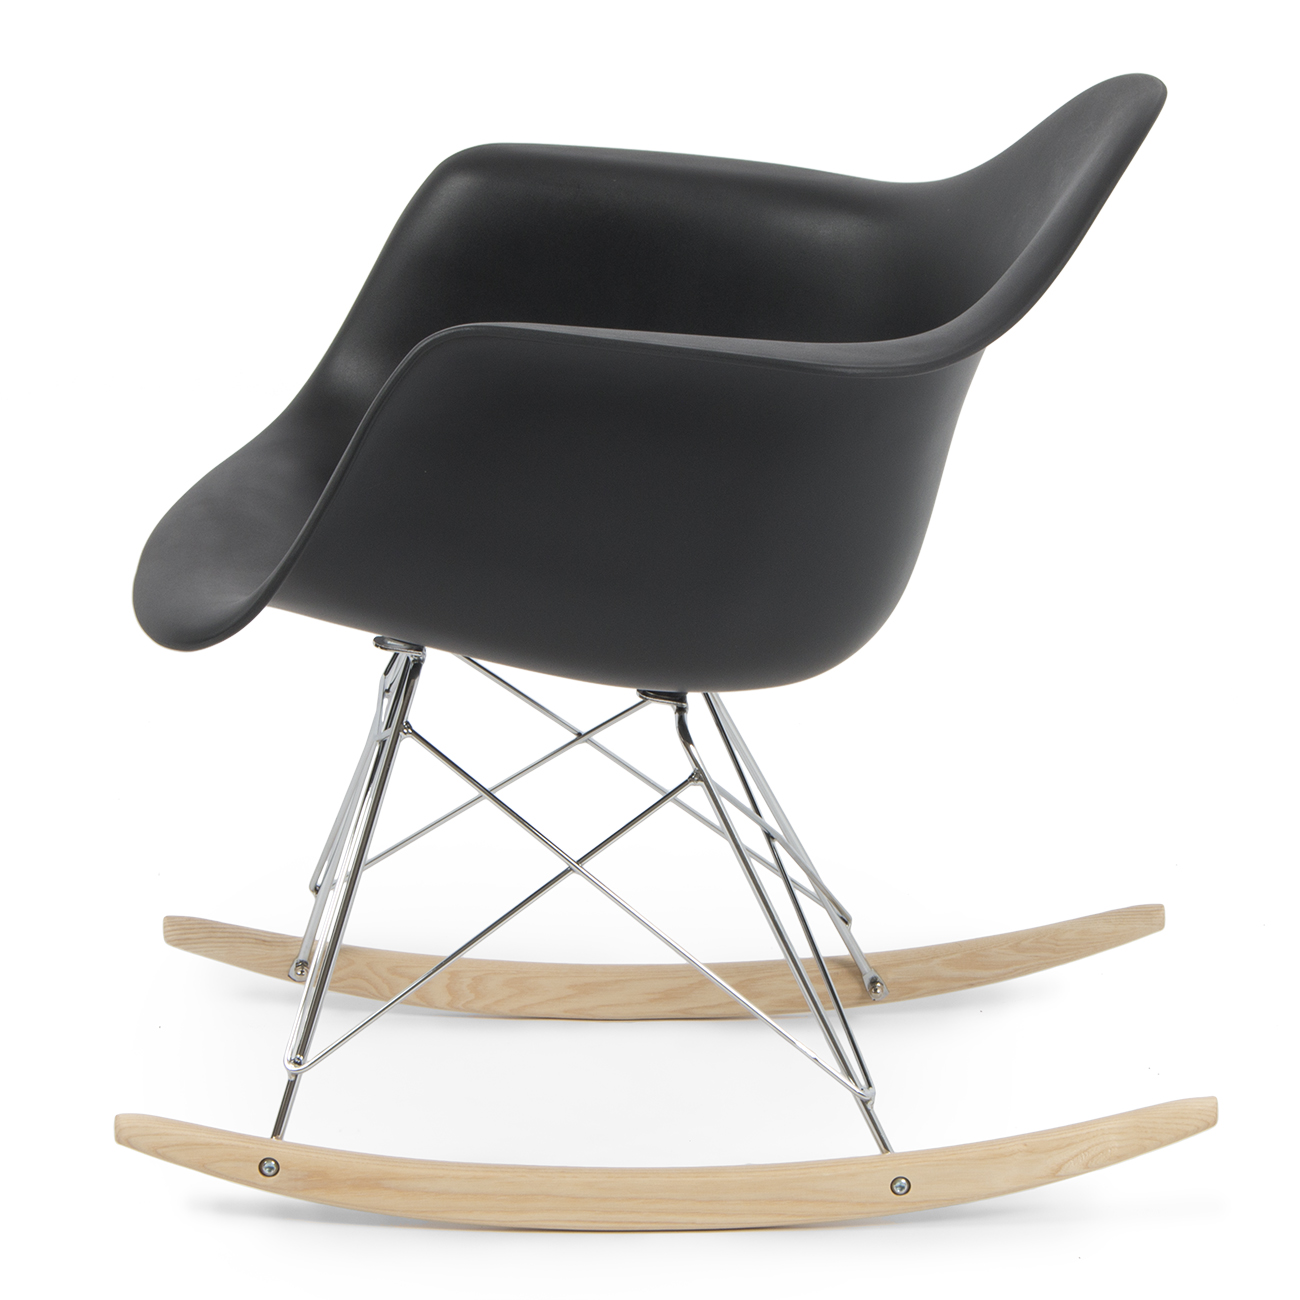 new eames rocker rocking indoor wood chair rar dsw style room retro modern room ebay. Black Bedroom Furniture Sets. Home Design Ideas